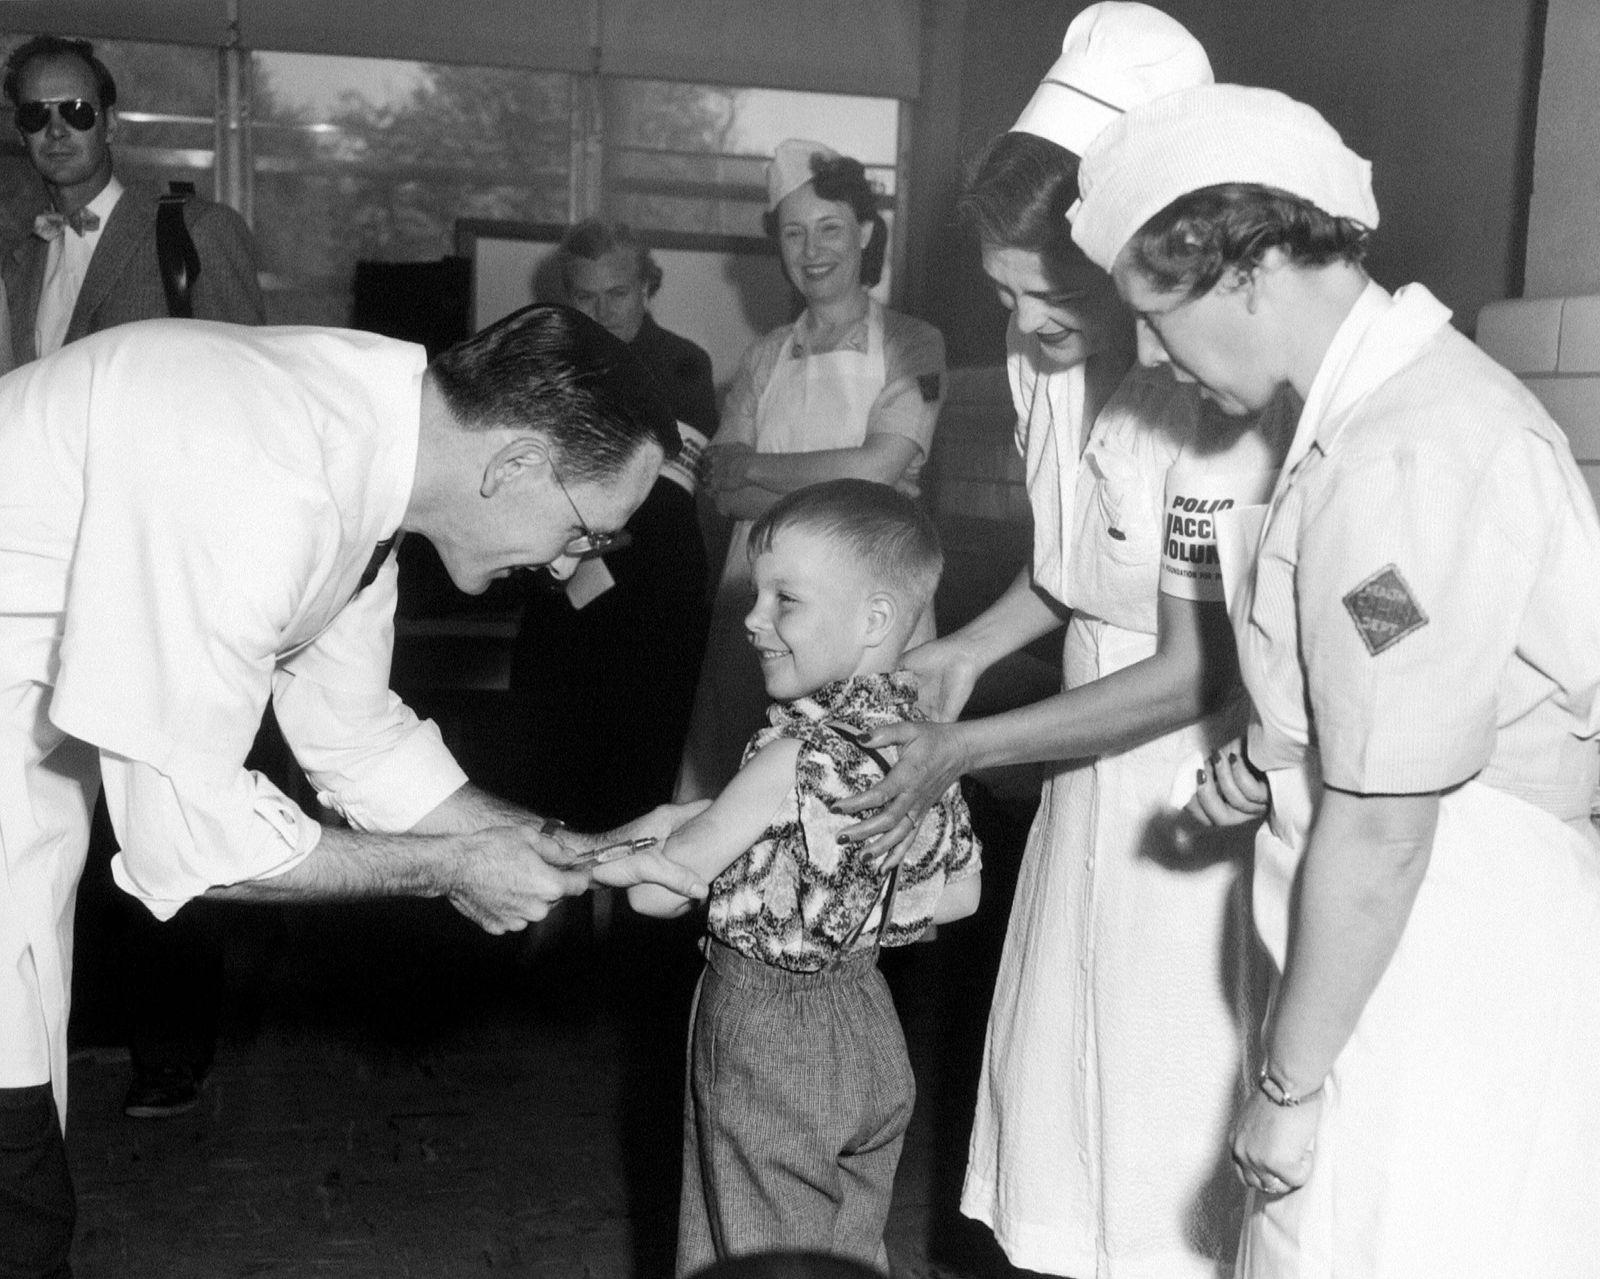 Dr. Richard Mulvaney Polio Impfung